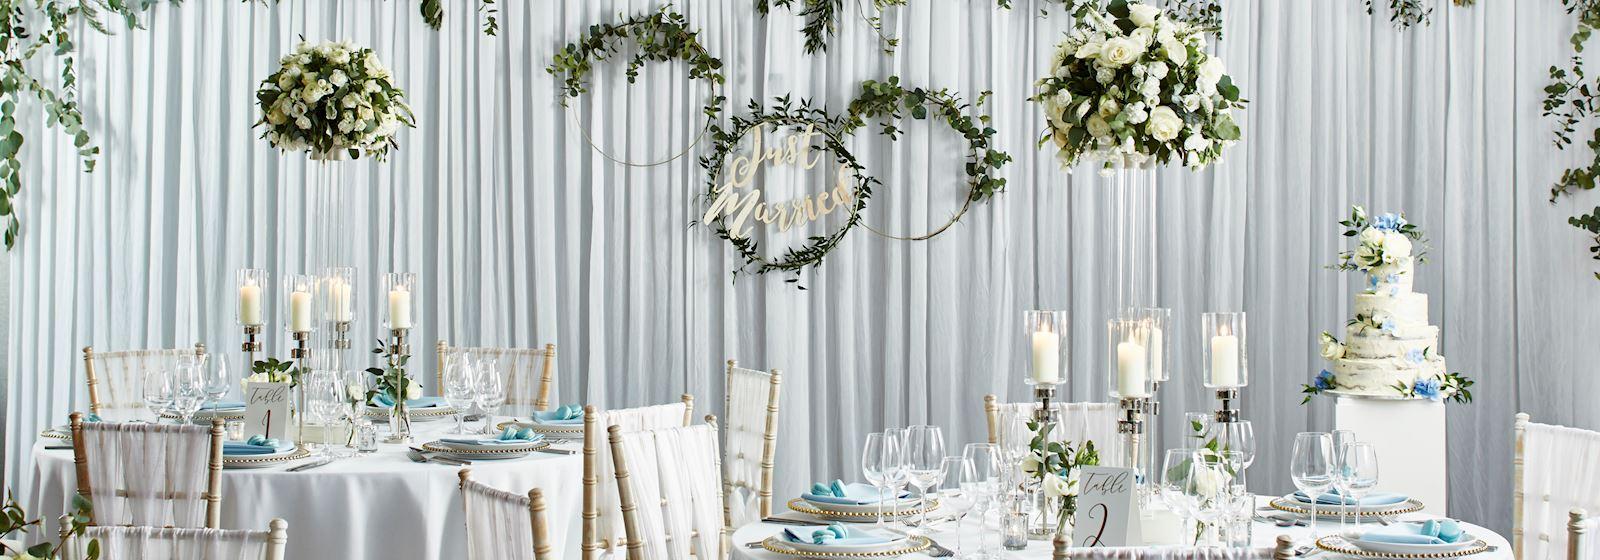 Birmingham Marriott Hotel Weddings